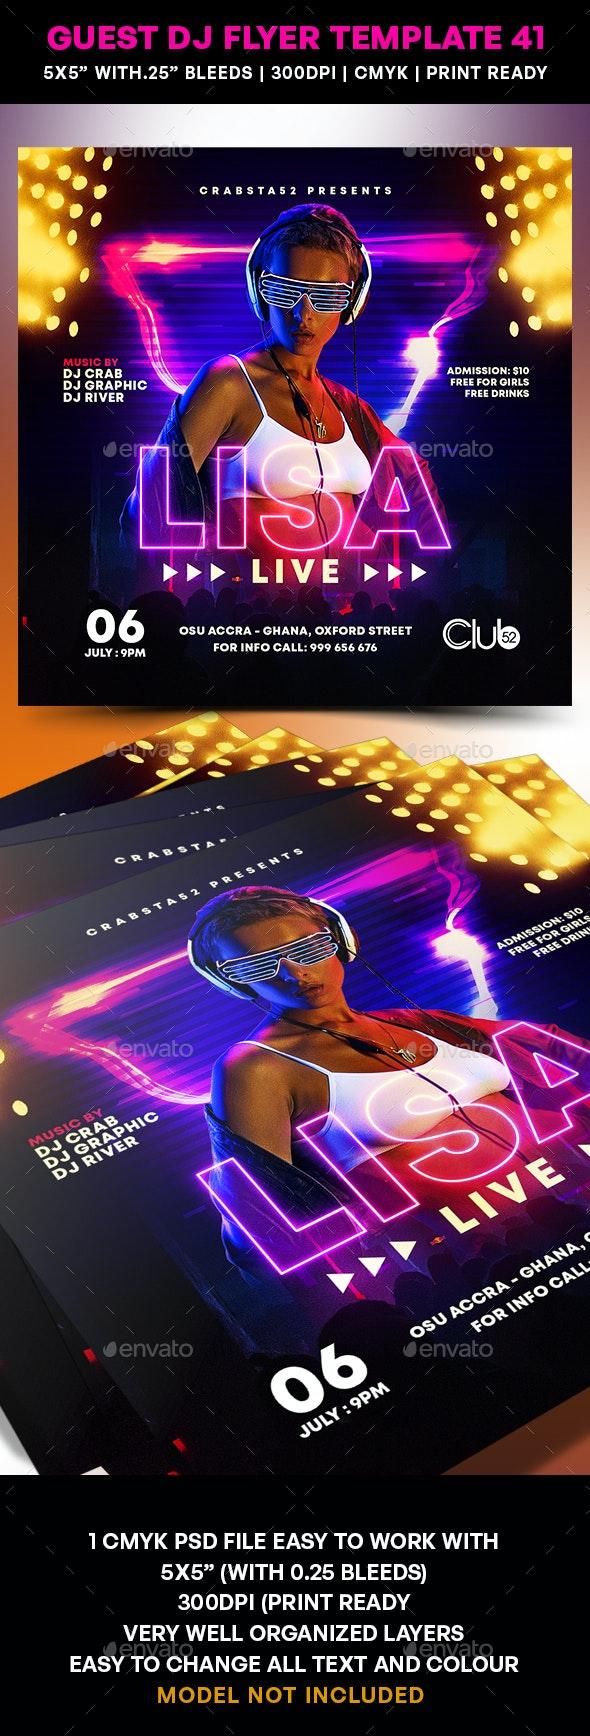 Guest DJ Flyer Template 41 - Flyers Print Templates